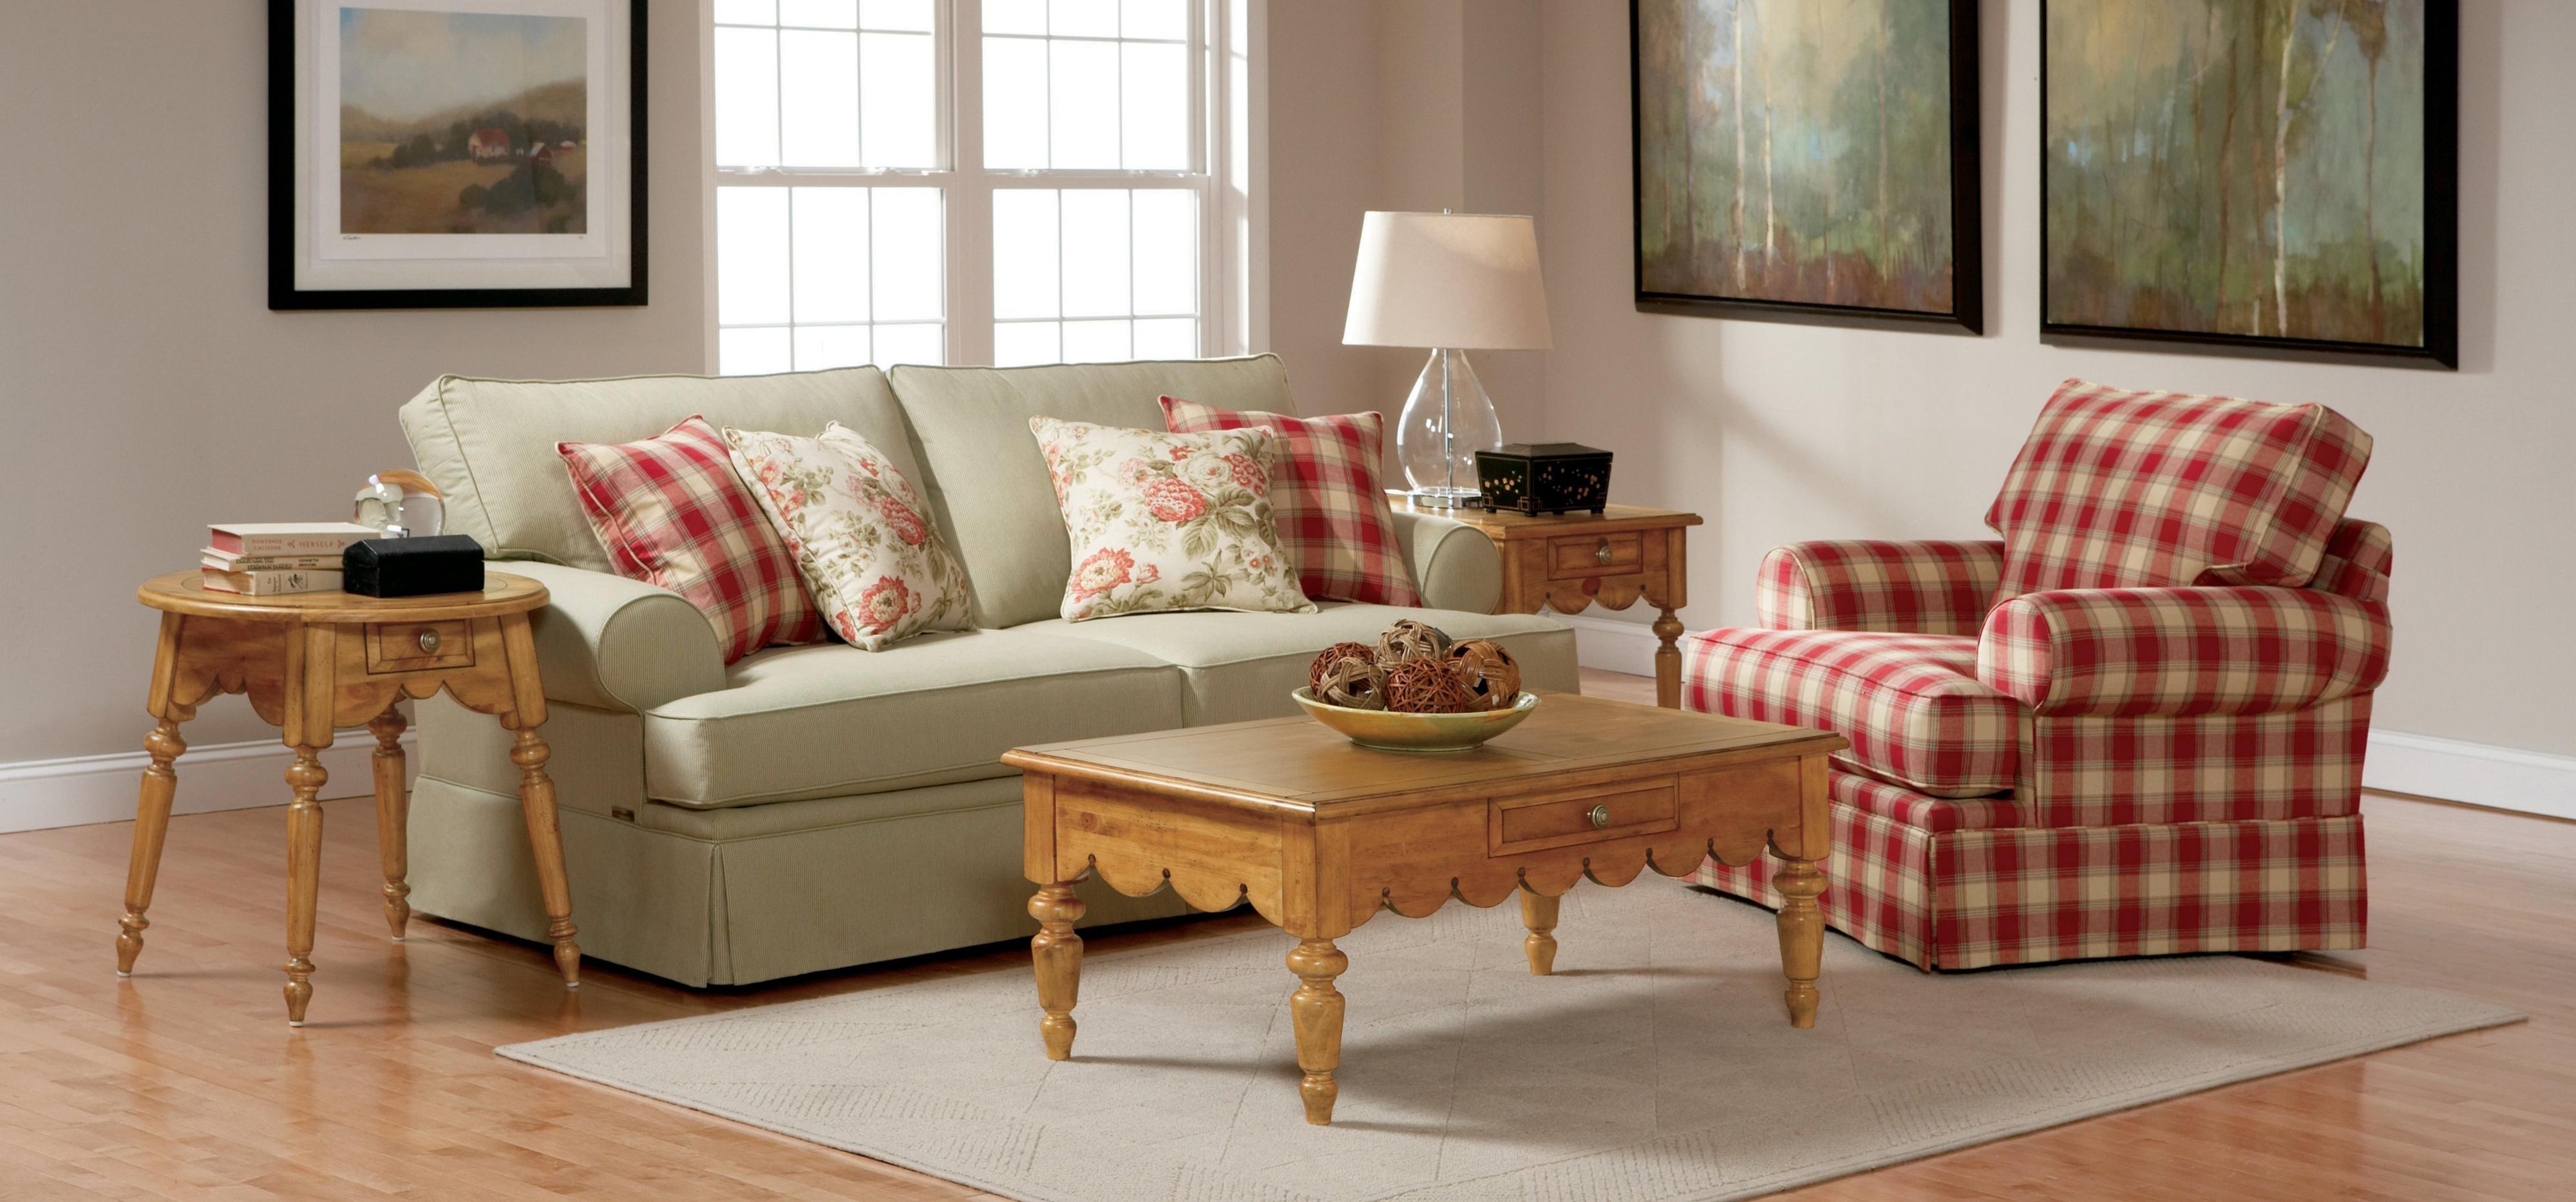 Broyhill Upholstery – Jordan Furniture Inside Broyhill Emily Sofas (Image 14 of 20)